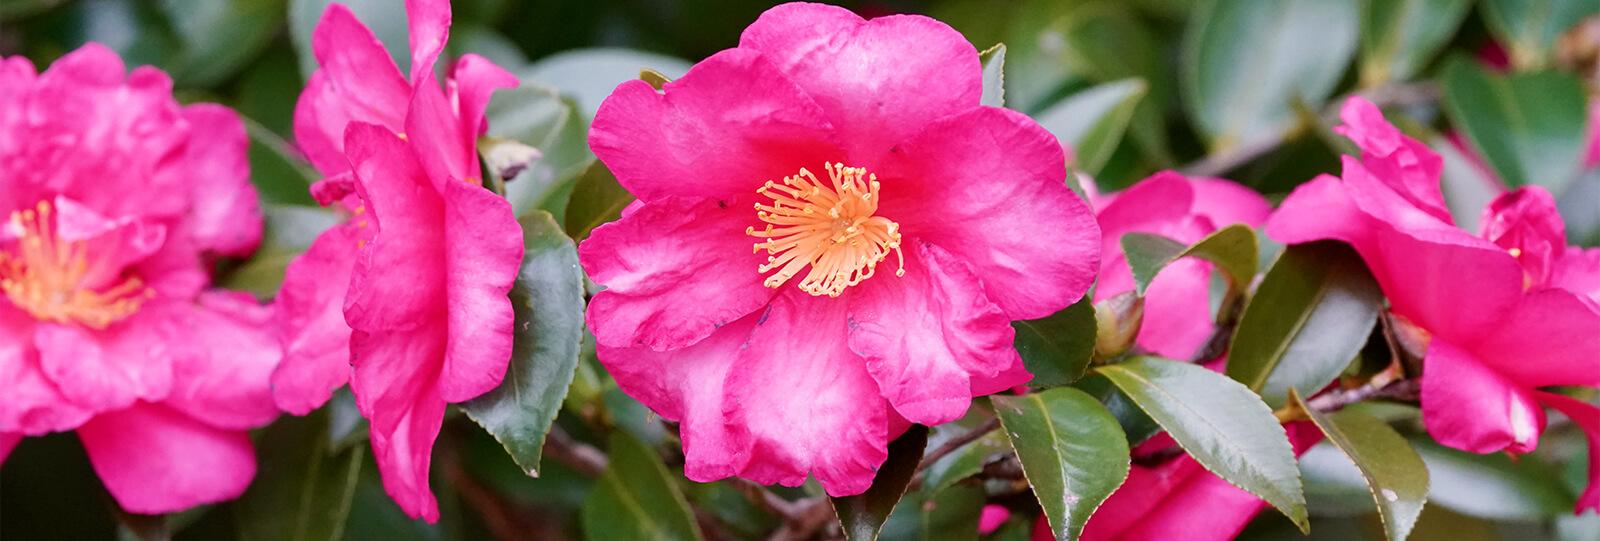 PFAS-camellias-in-houston-camellia-shi-shi-gashira